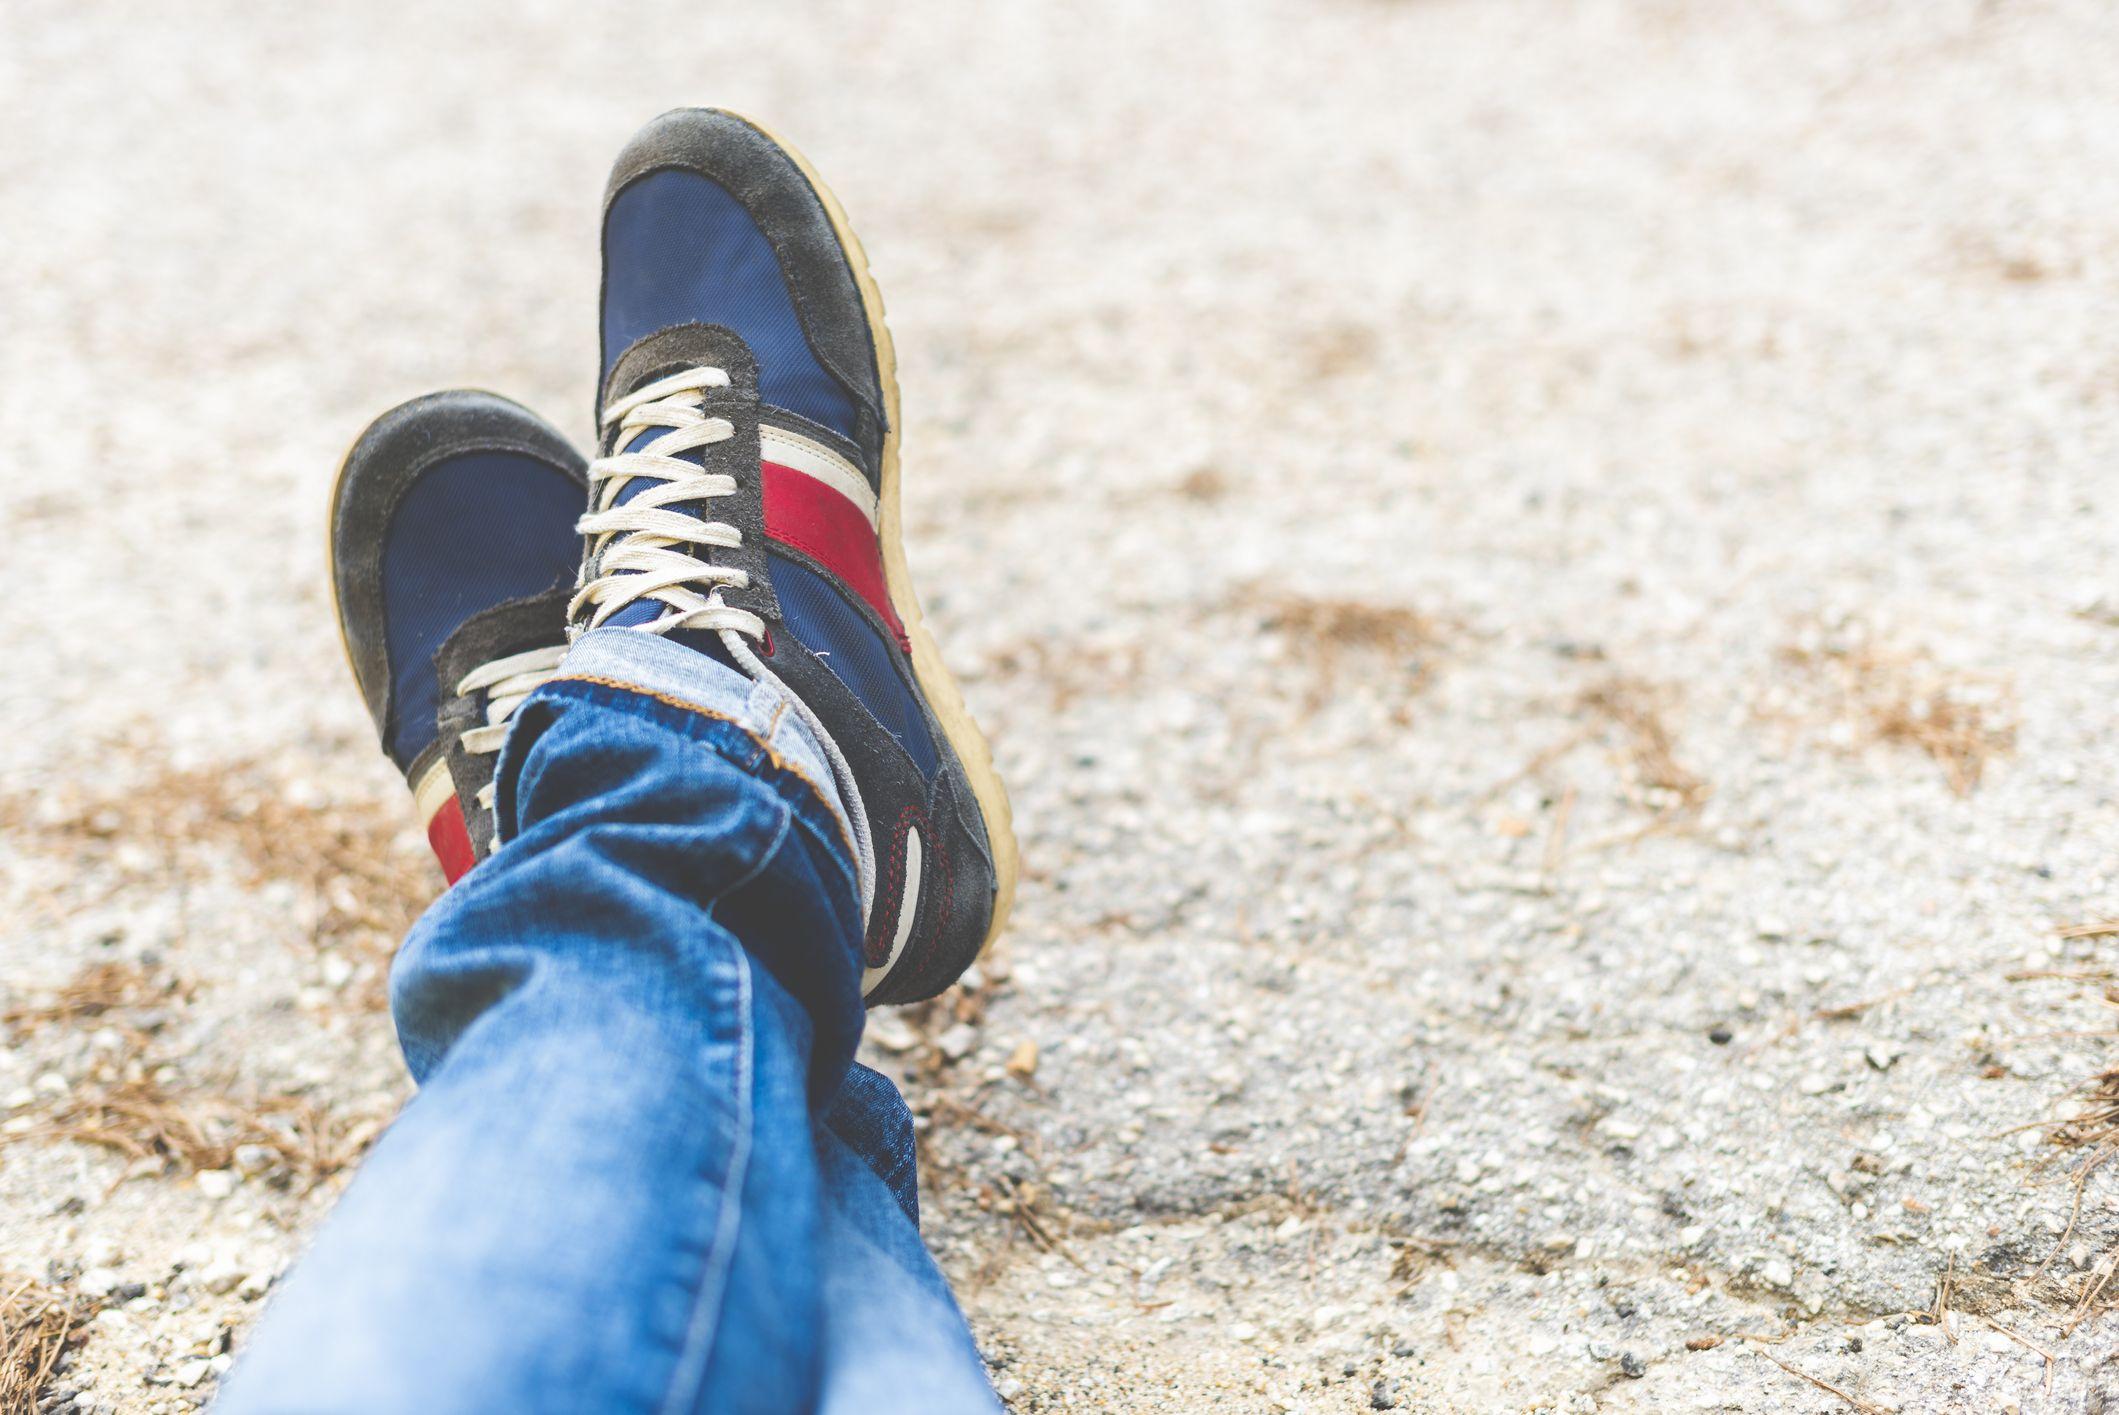 Retro Sneakers That Prove Old-School